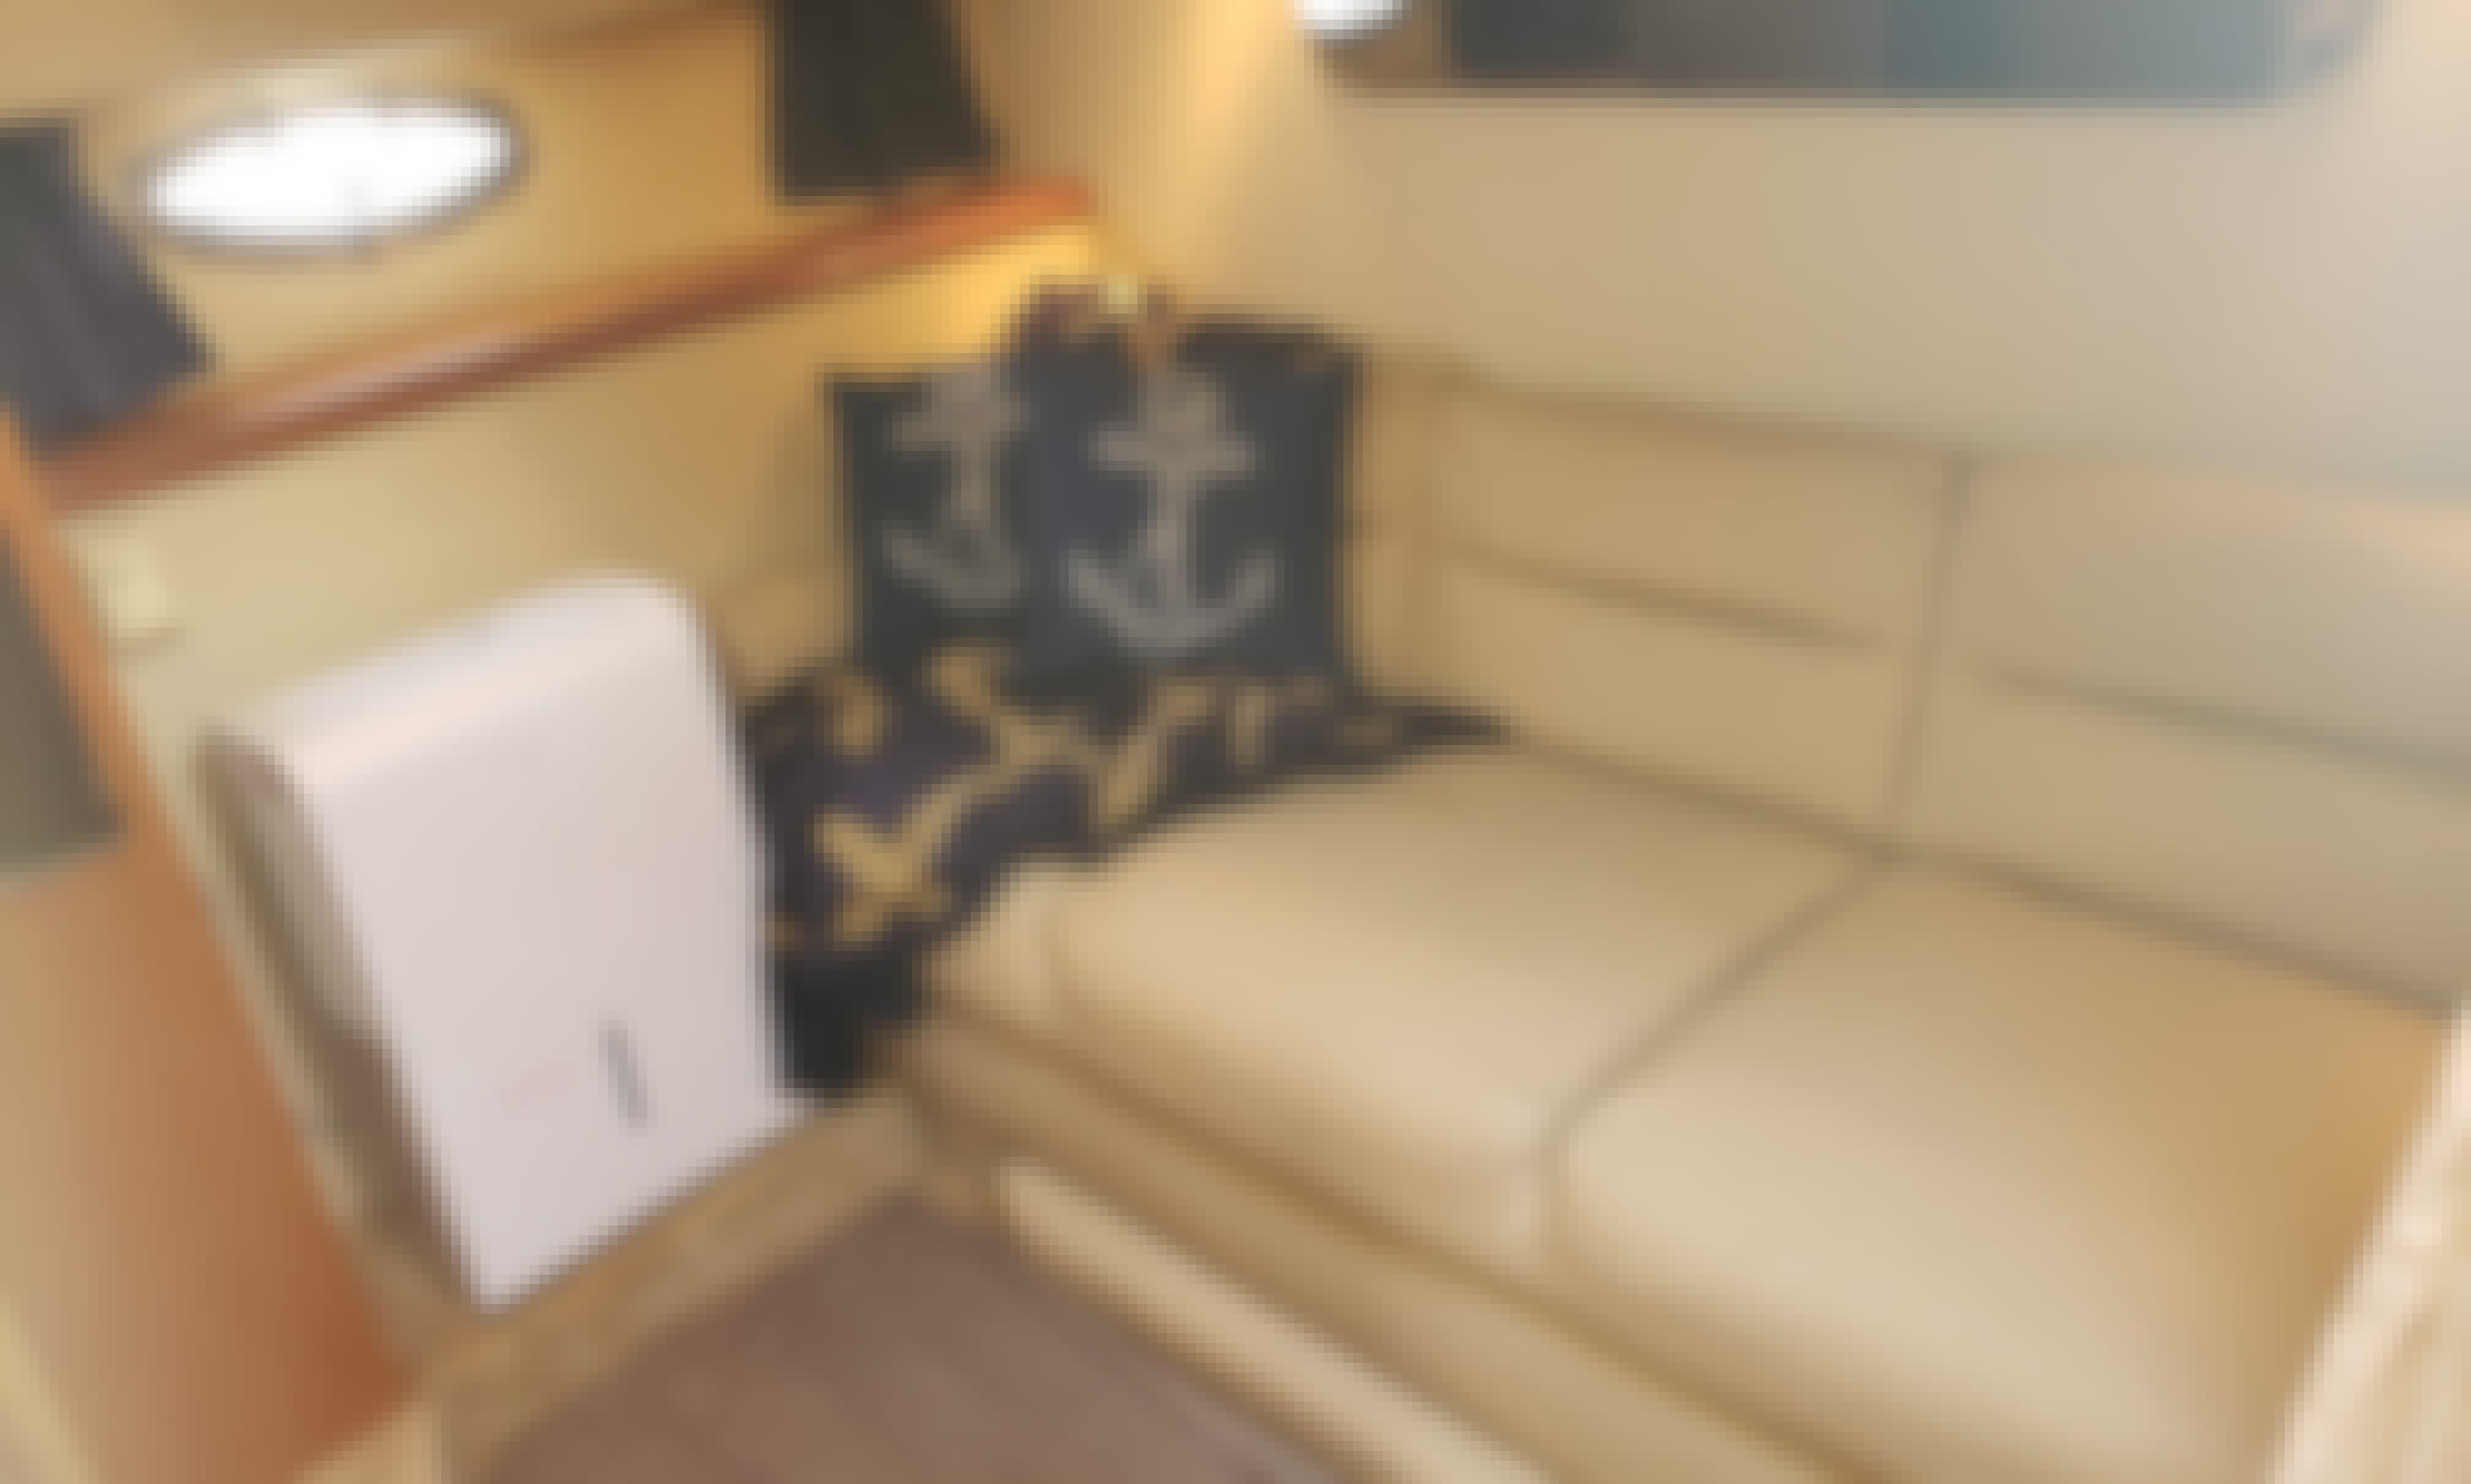 36 FT Cruiser Yachts miami, Sunny isles, Aventura,sand bar